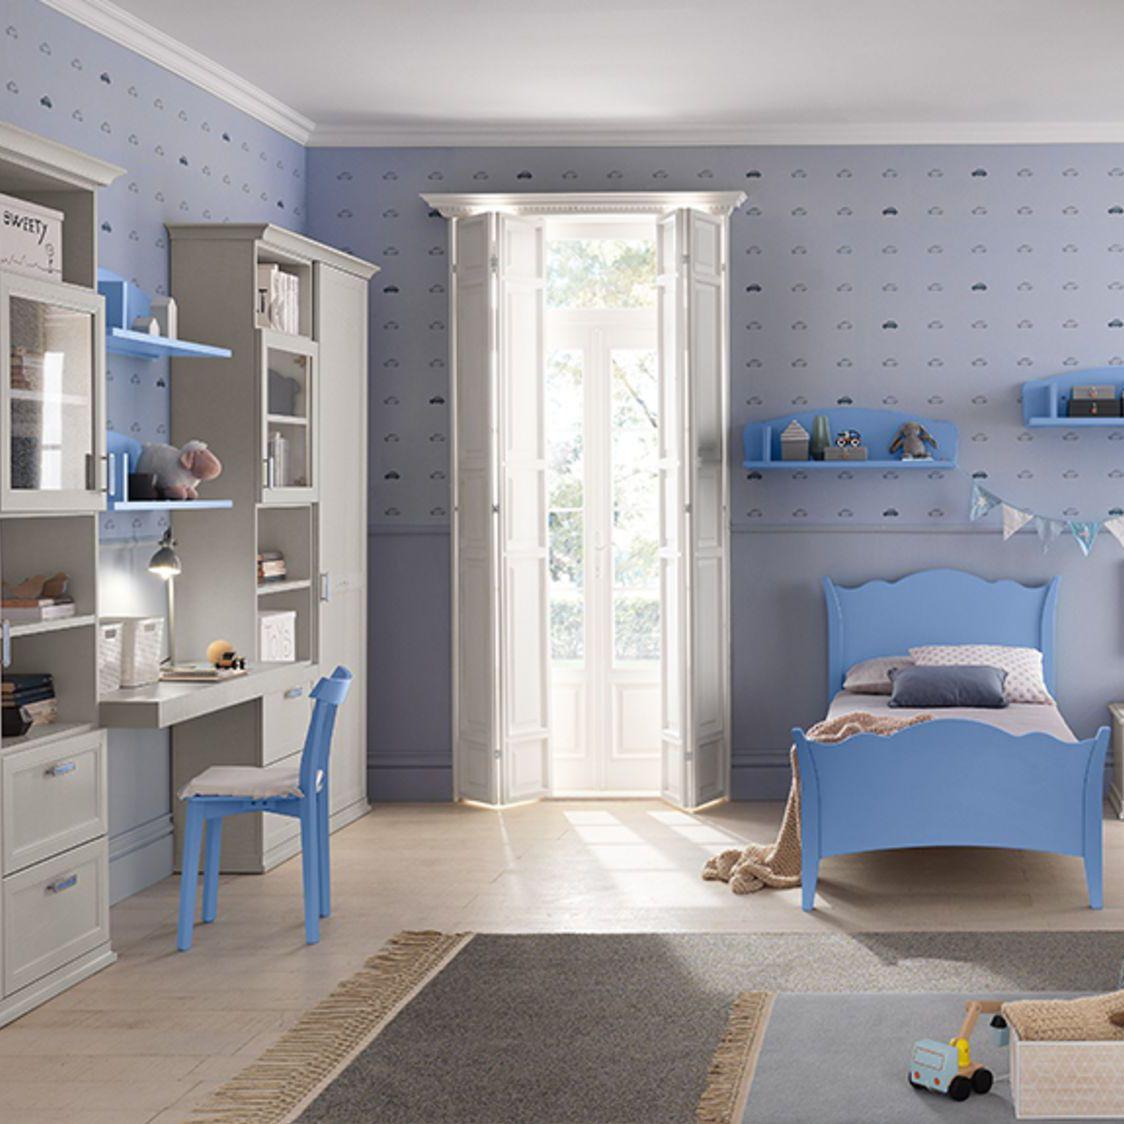 Full Size of Weies Kinderzimmer Blau Lackiertes Holz Fr Jungen Regal Sofa Weiß Regale Kinderzimmer Jungen Kinderzimmer